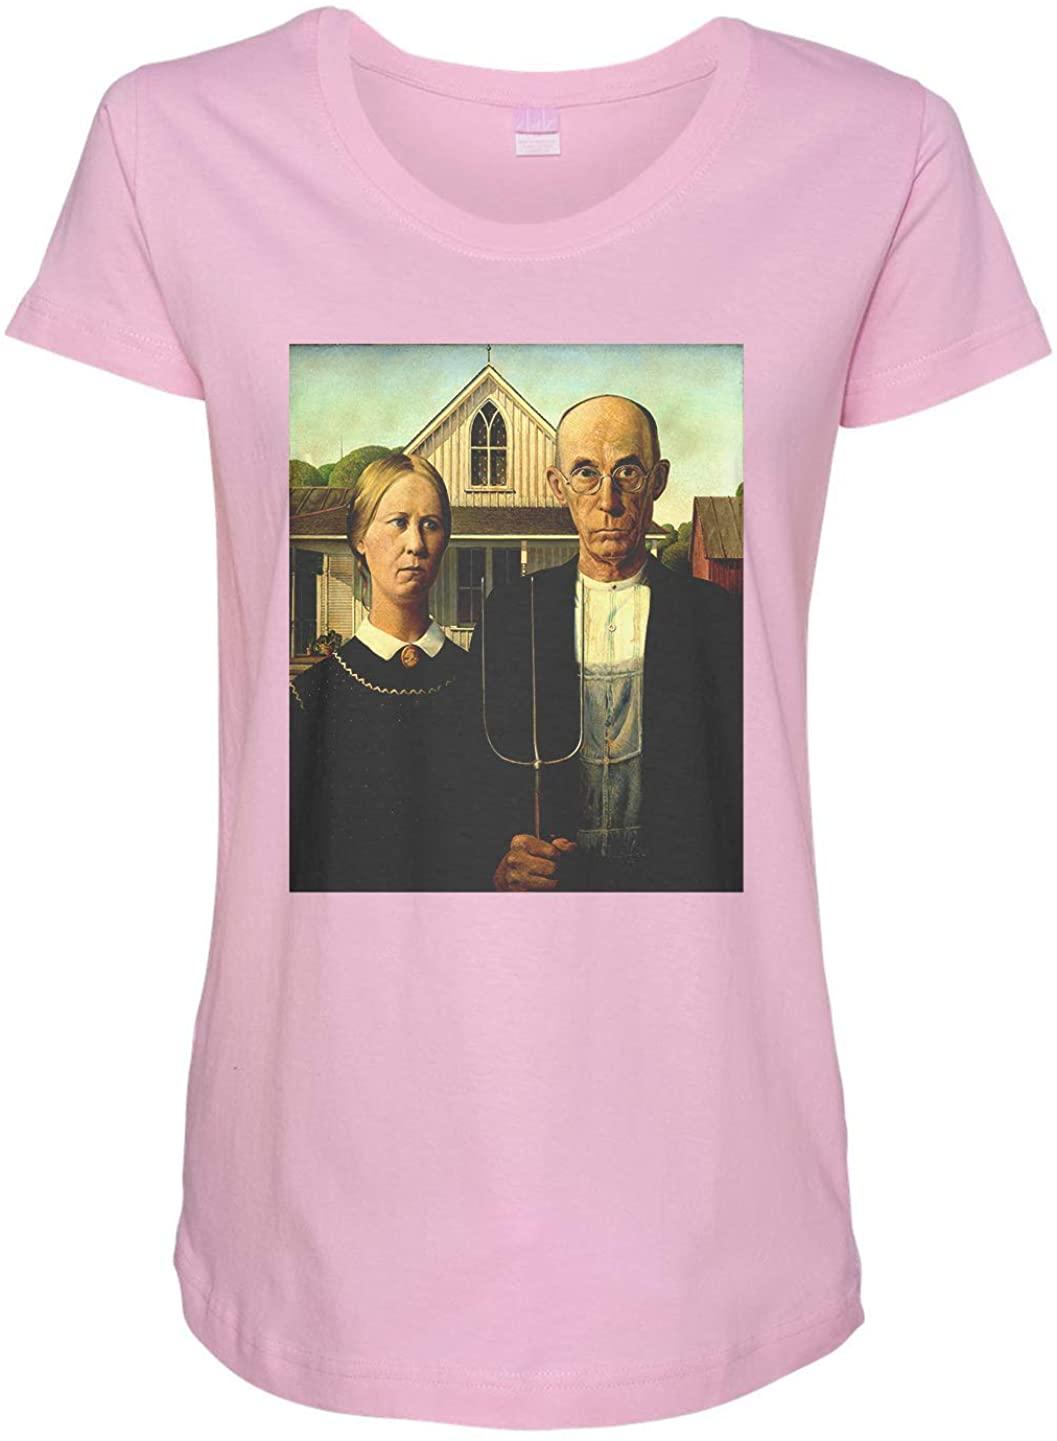 Tenacitee Ladies American Gothic Maternity Shirt